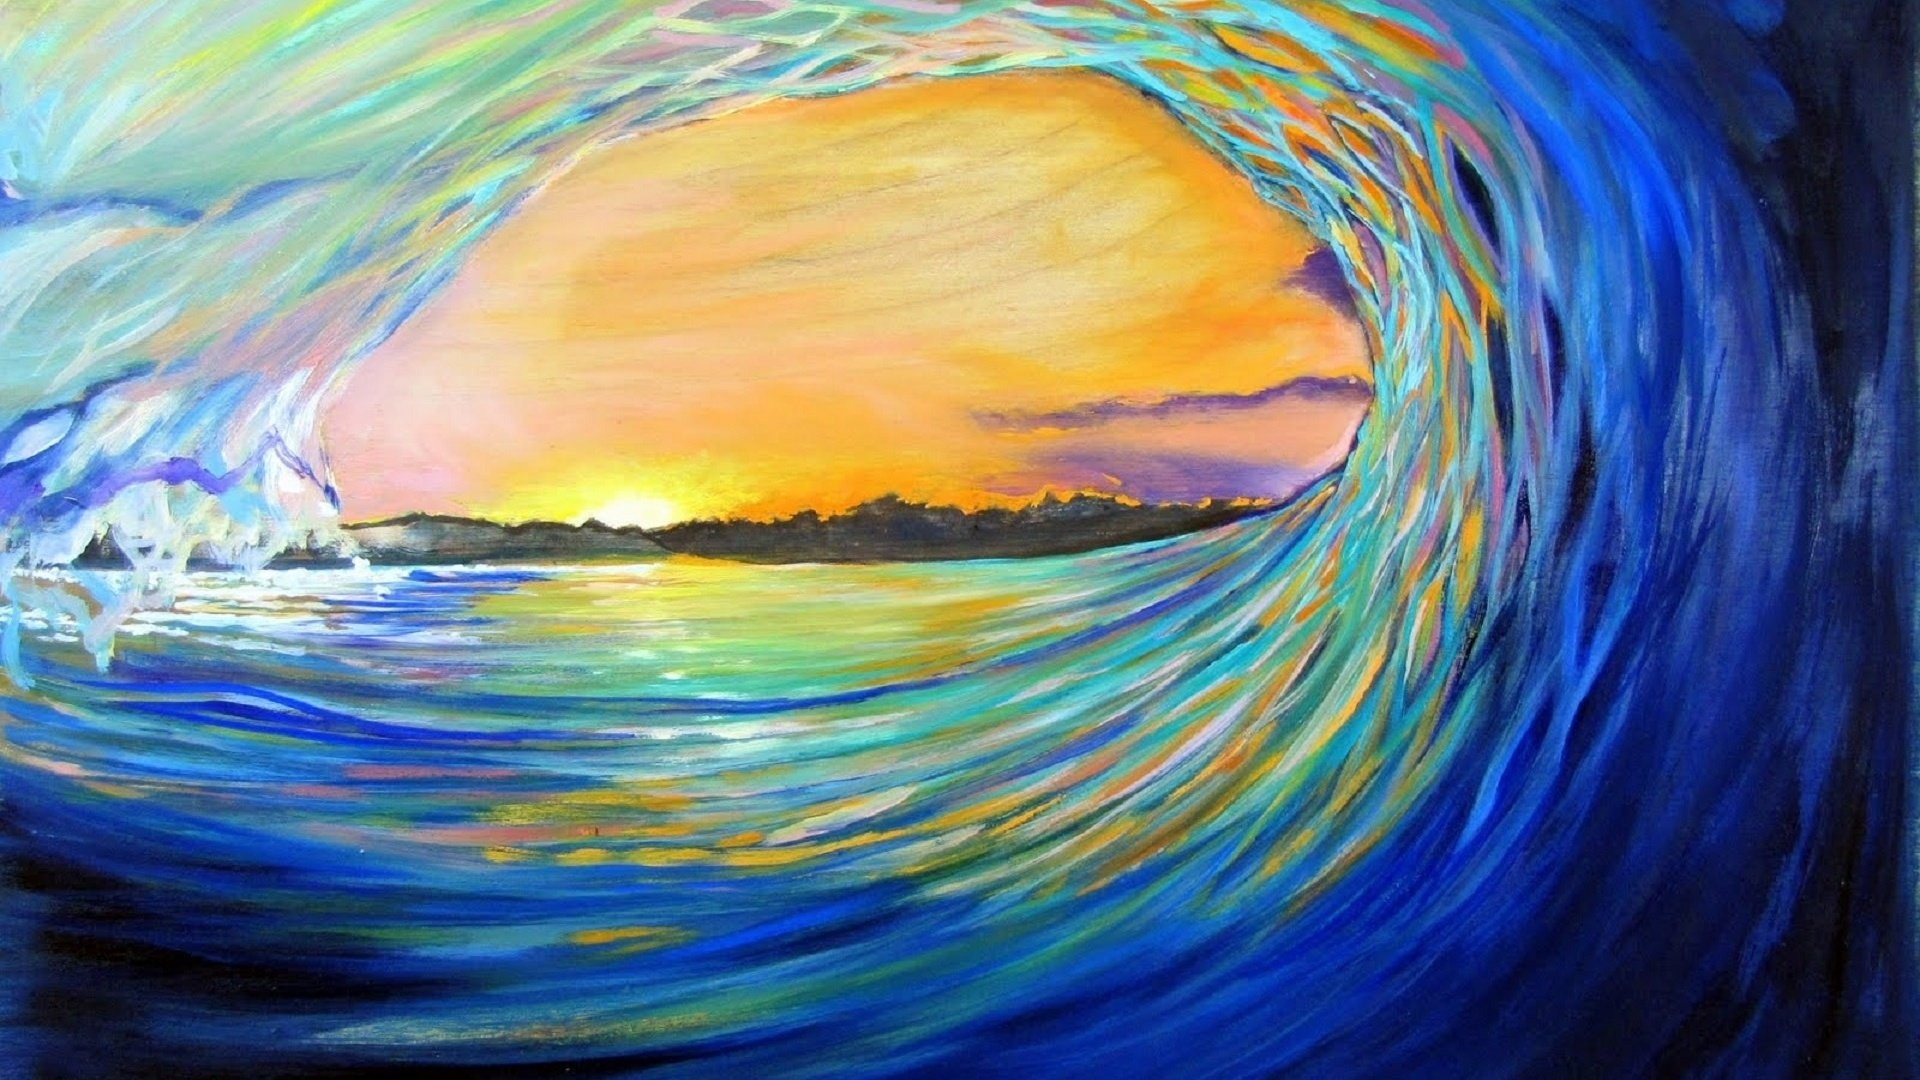 Artistic – Wave Artistic Ocean Sea Painting Sun Sunset Wallpaper